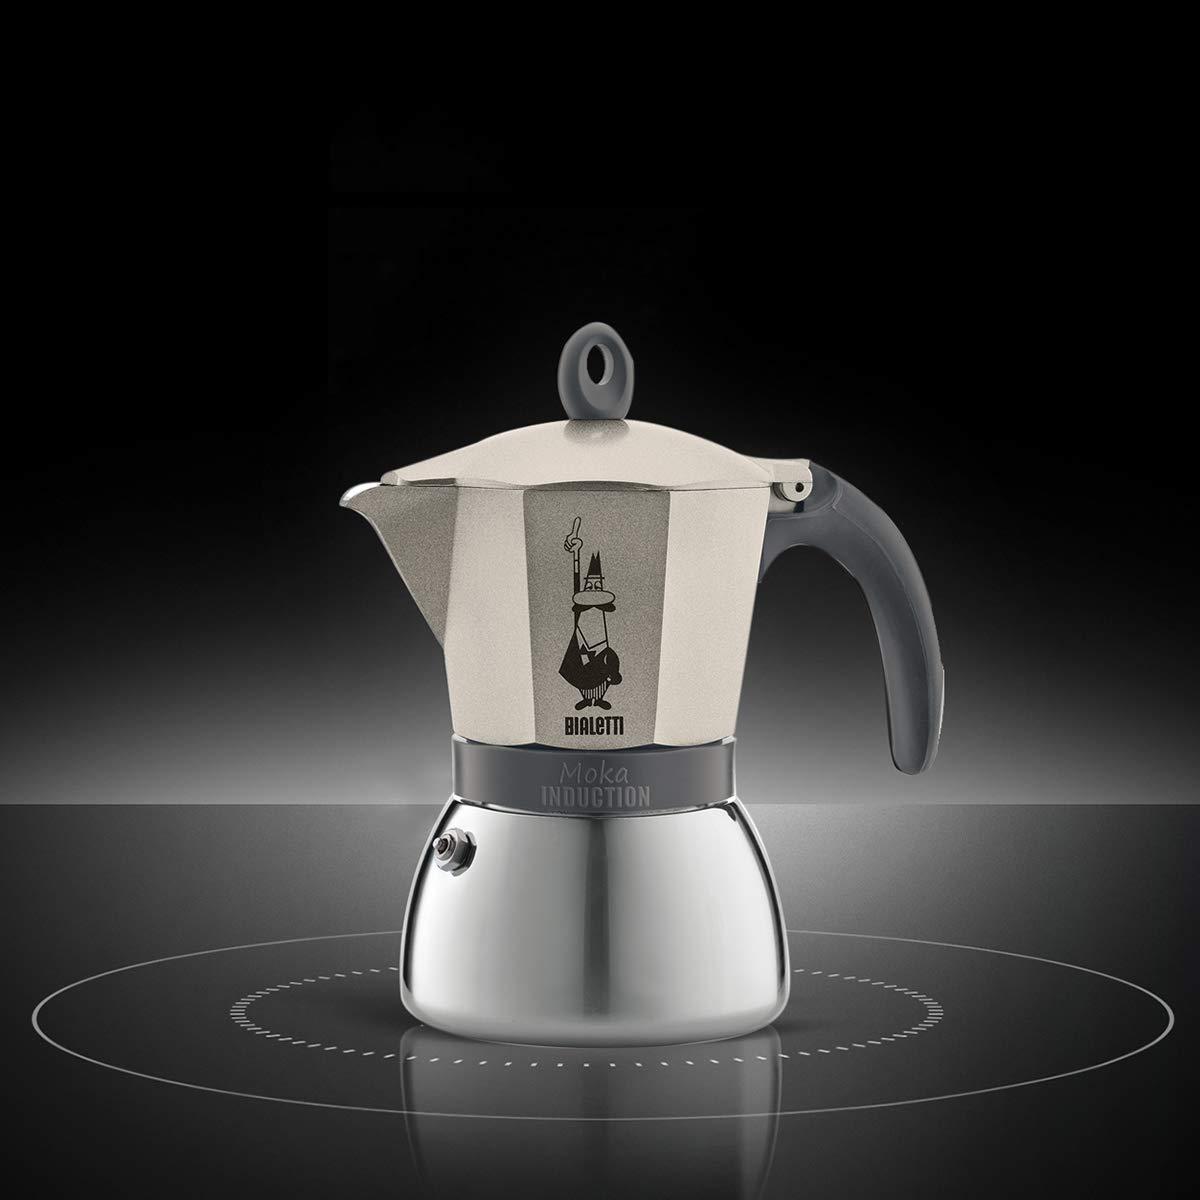 Bialetti Moka Induction, cafetera con Base de Acero para inducción, Color Oro 6 Tazas